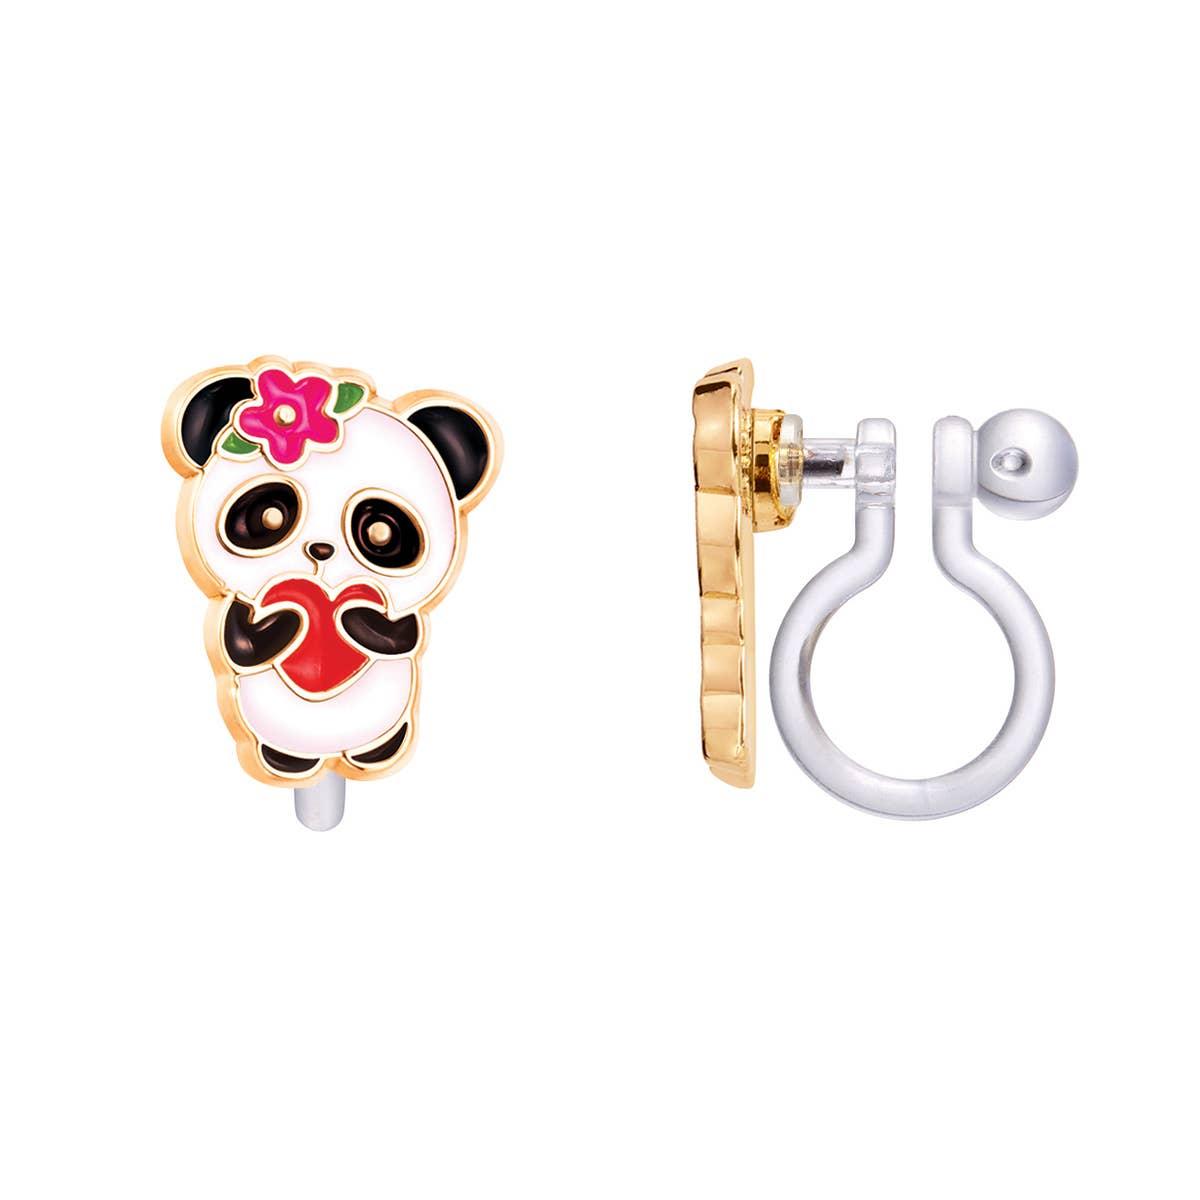 CLIP ON Cutie Earrings- Panda Love   Trada Marketplace